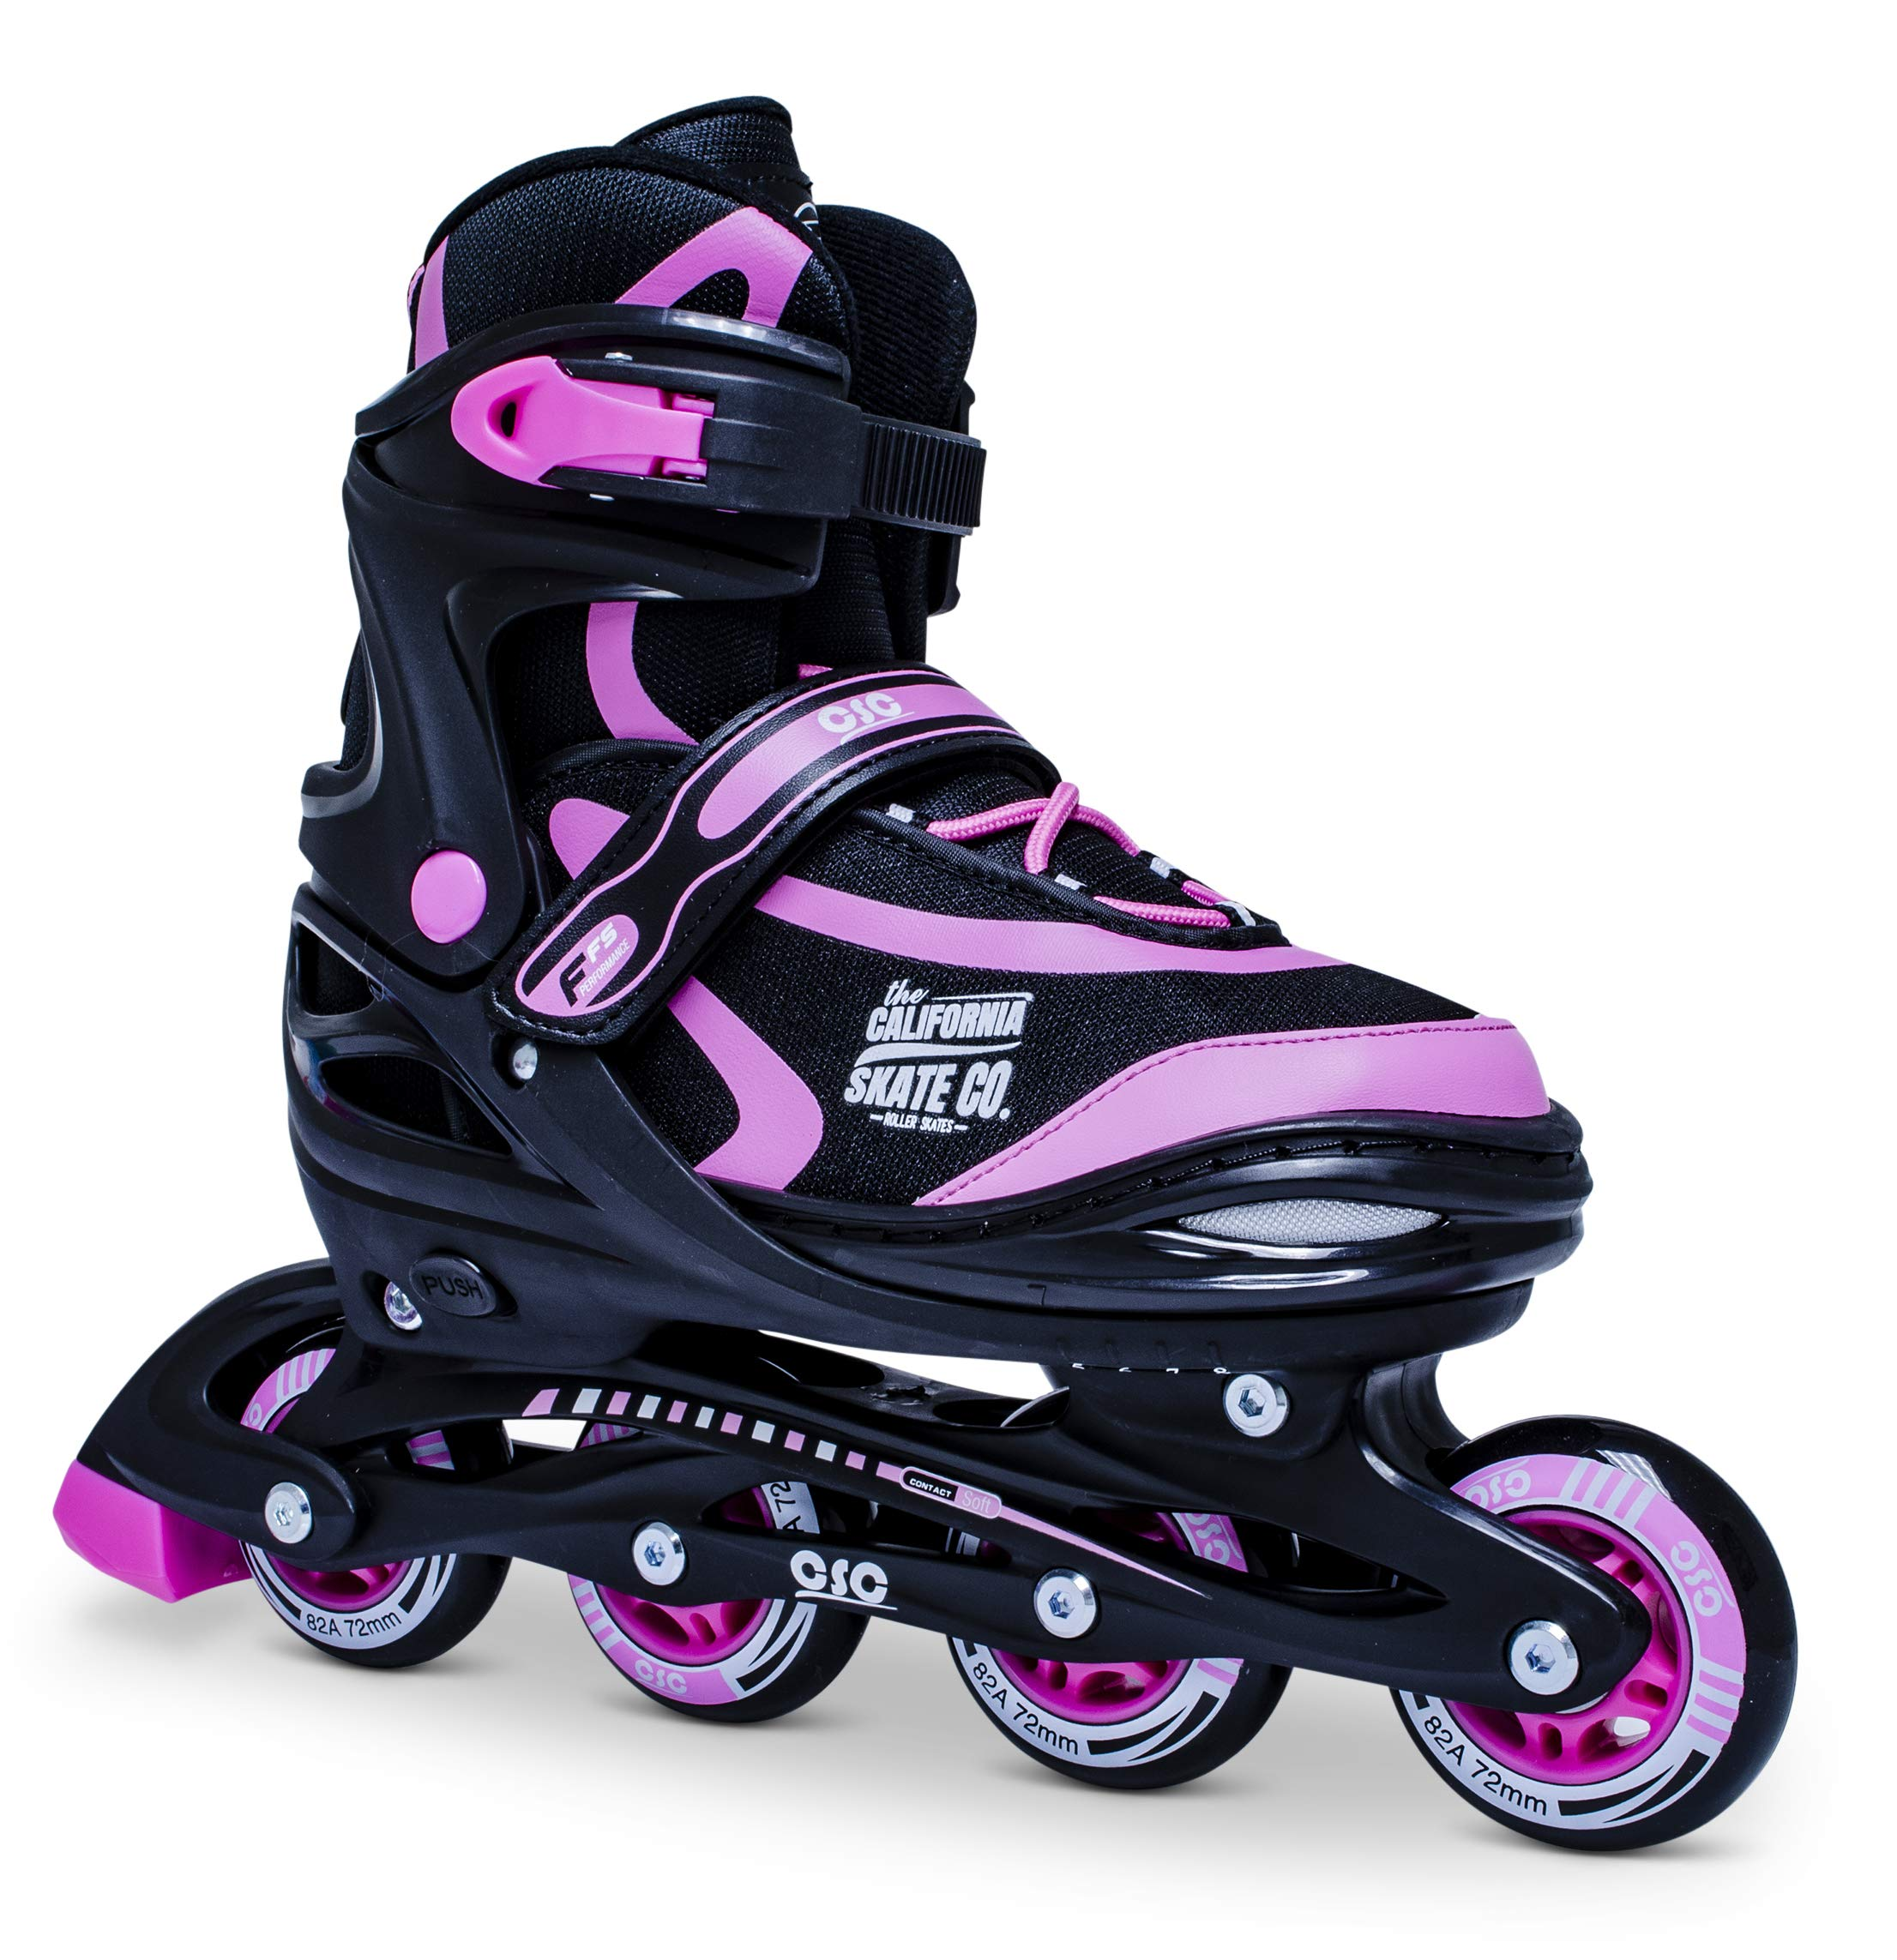 California Skate Co Zuma Kids Adjustable Inline Skates (Black and Pink, 1-4)